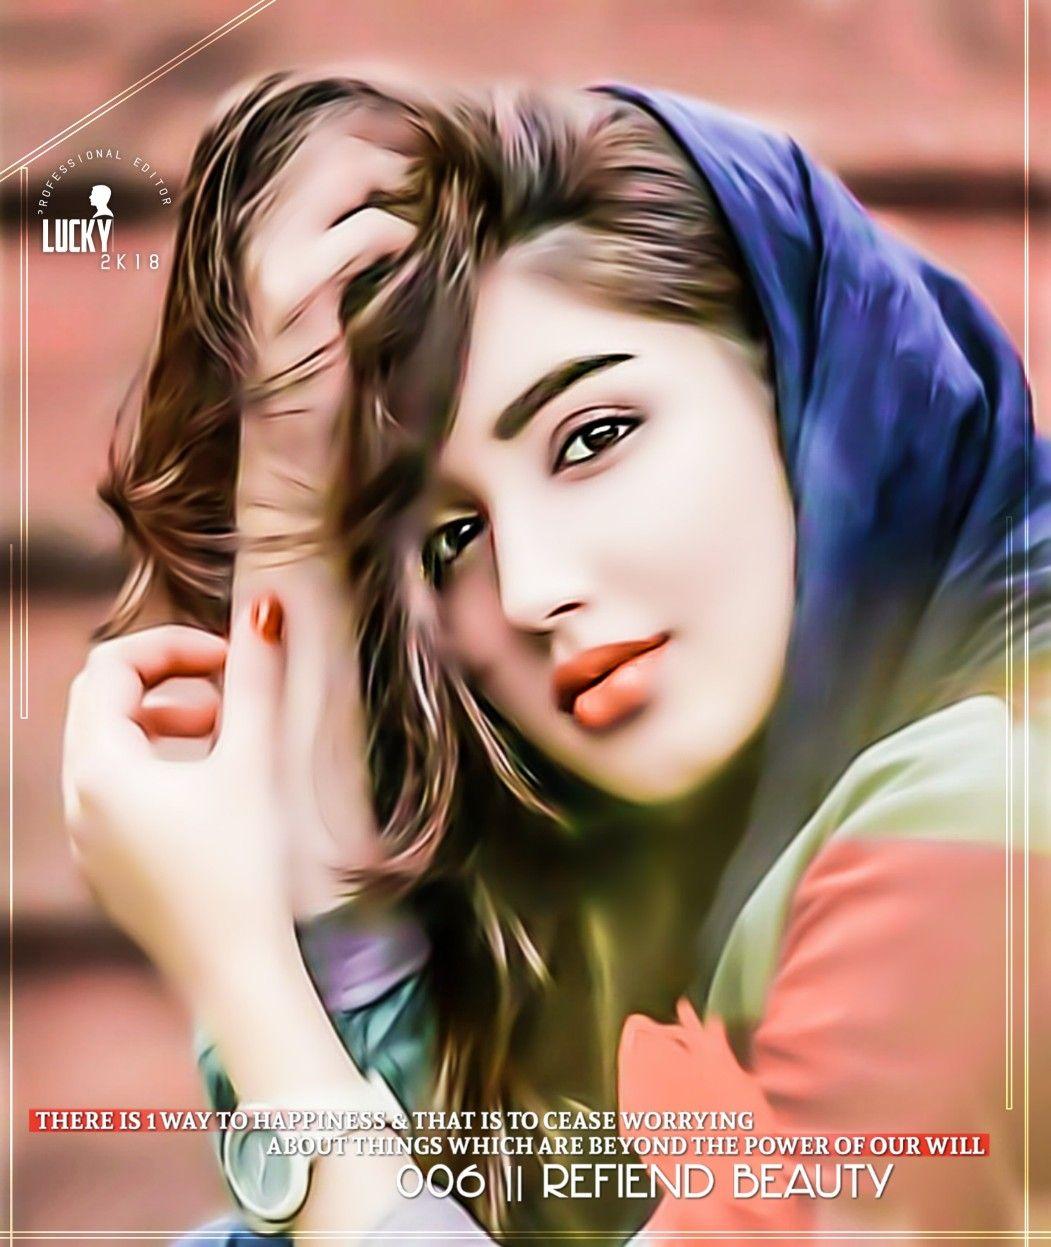 Lucky Artwork Cute Girl Poses Beautiful Girl Image Beautiful Girl Wallpaper